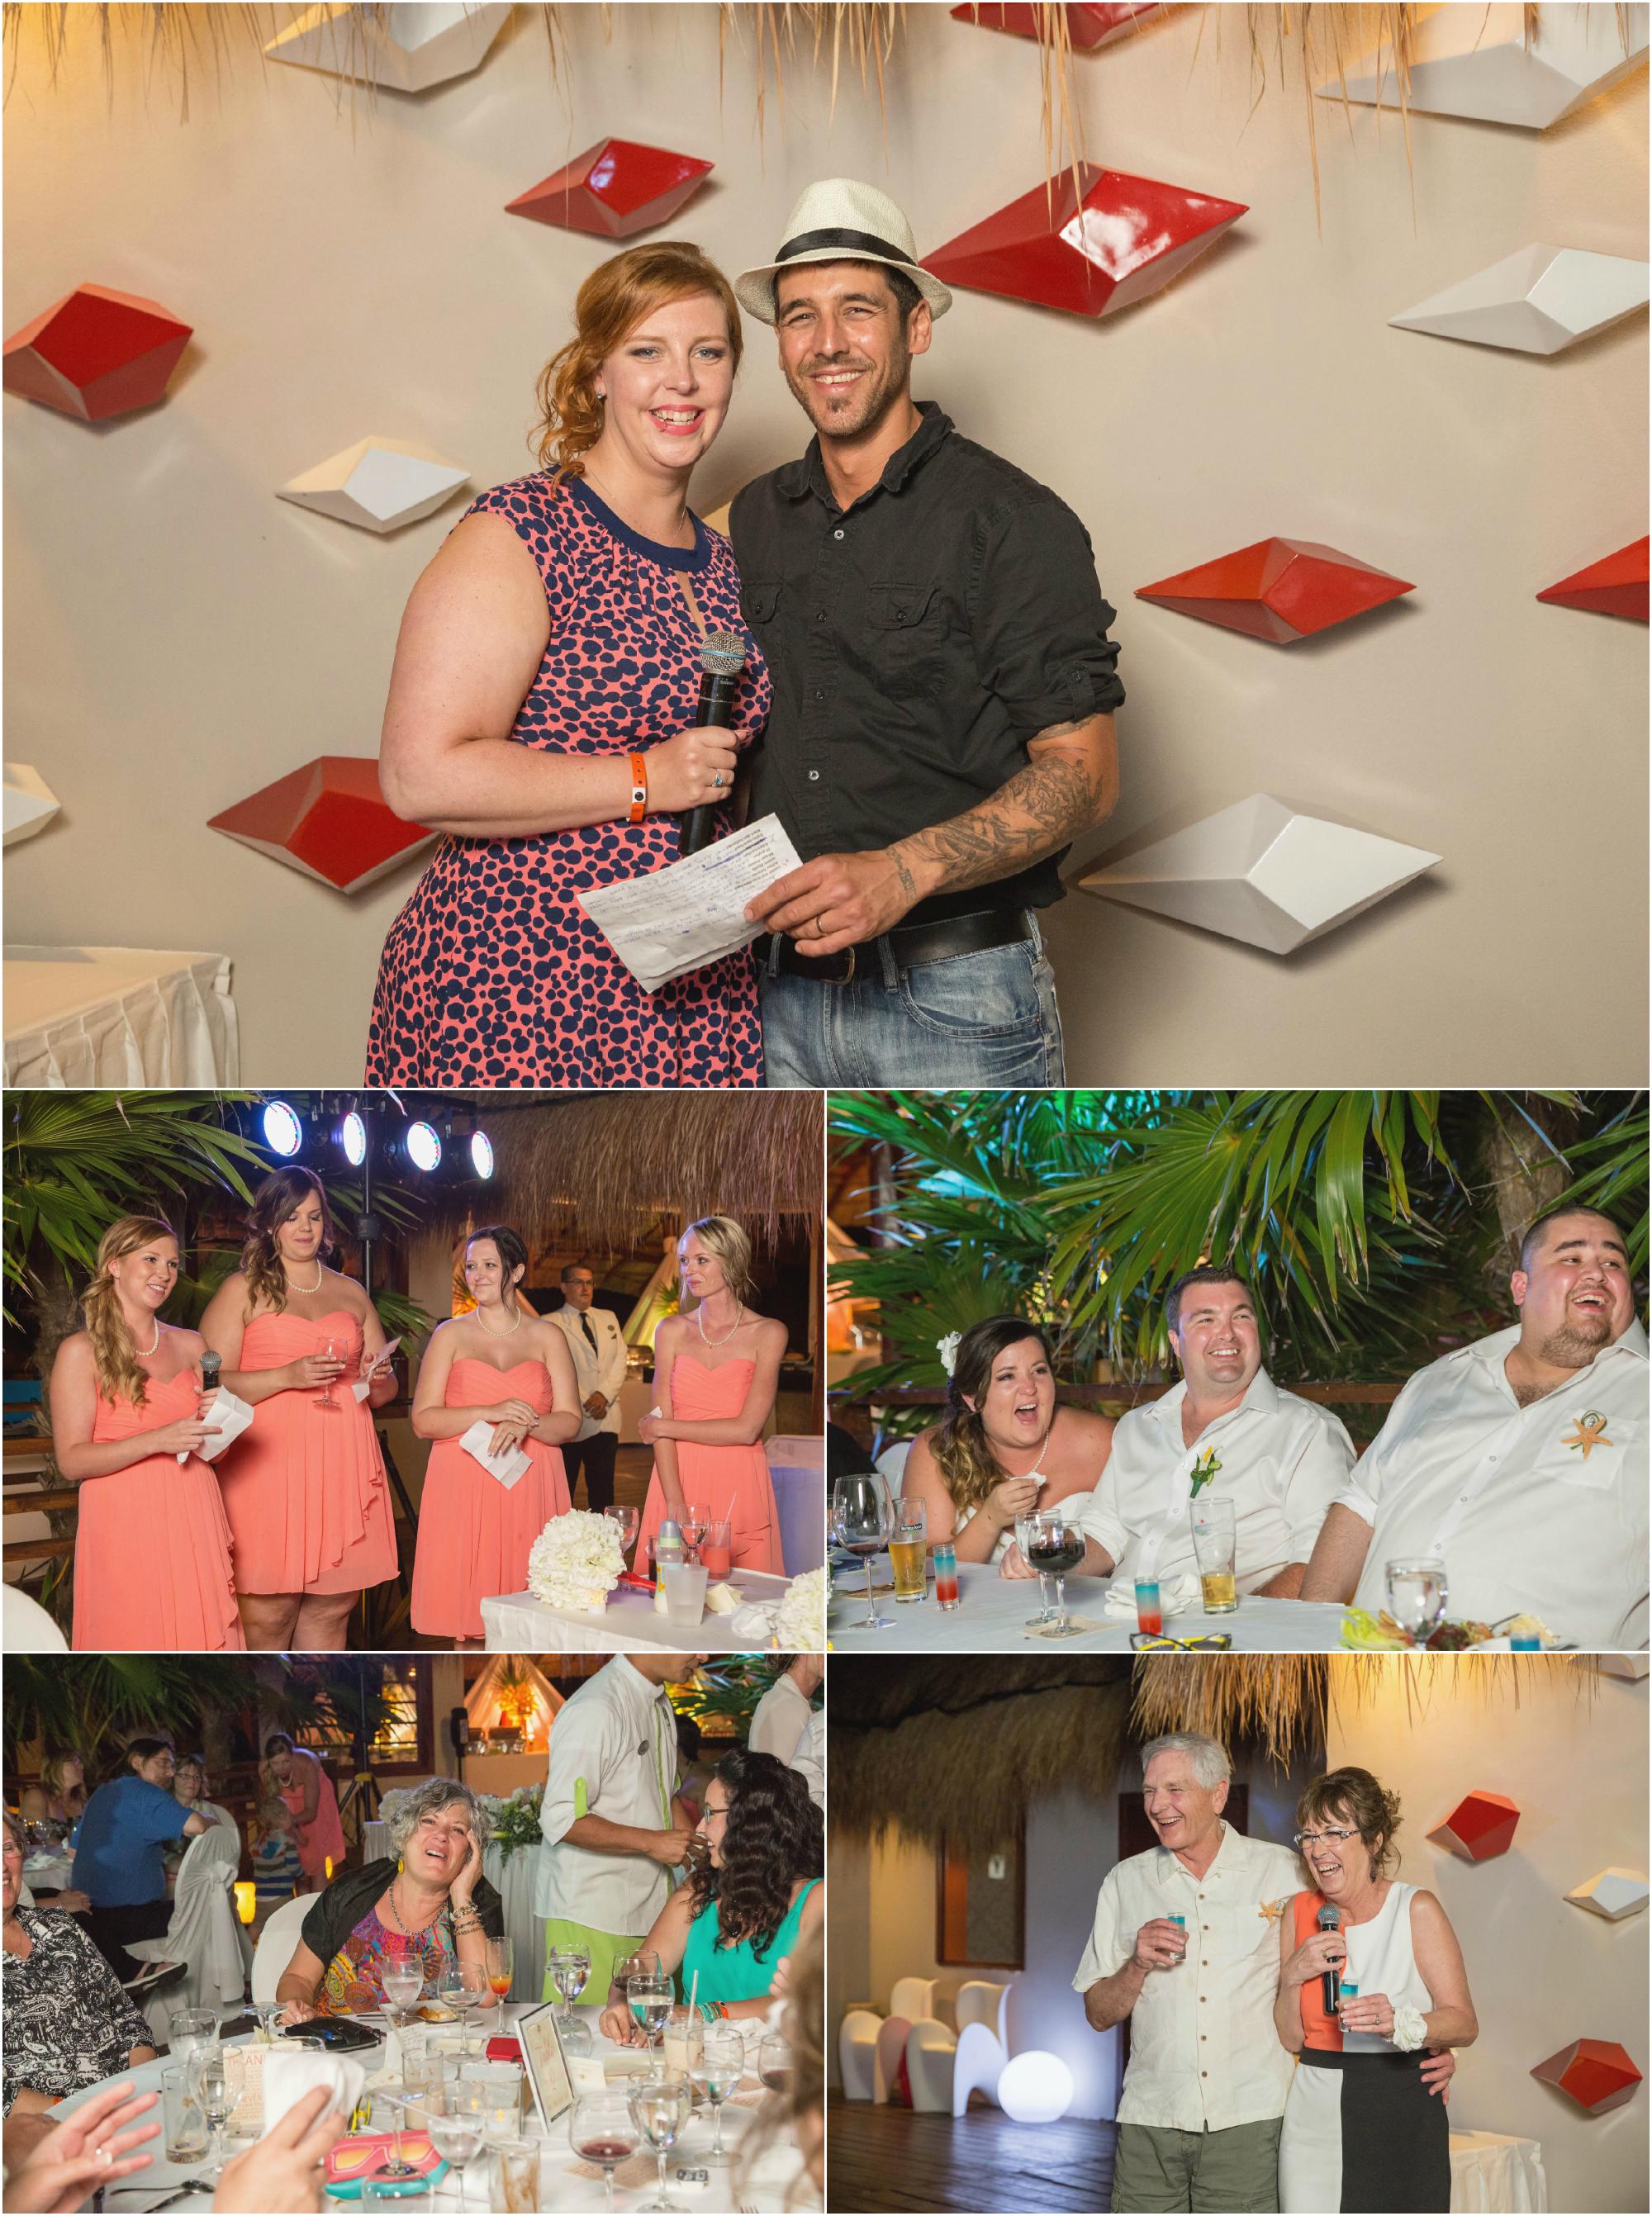 cancun_wedding39.png